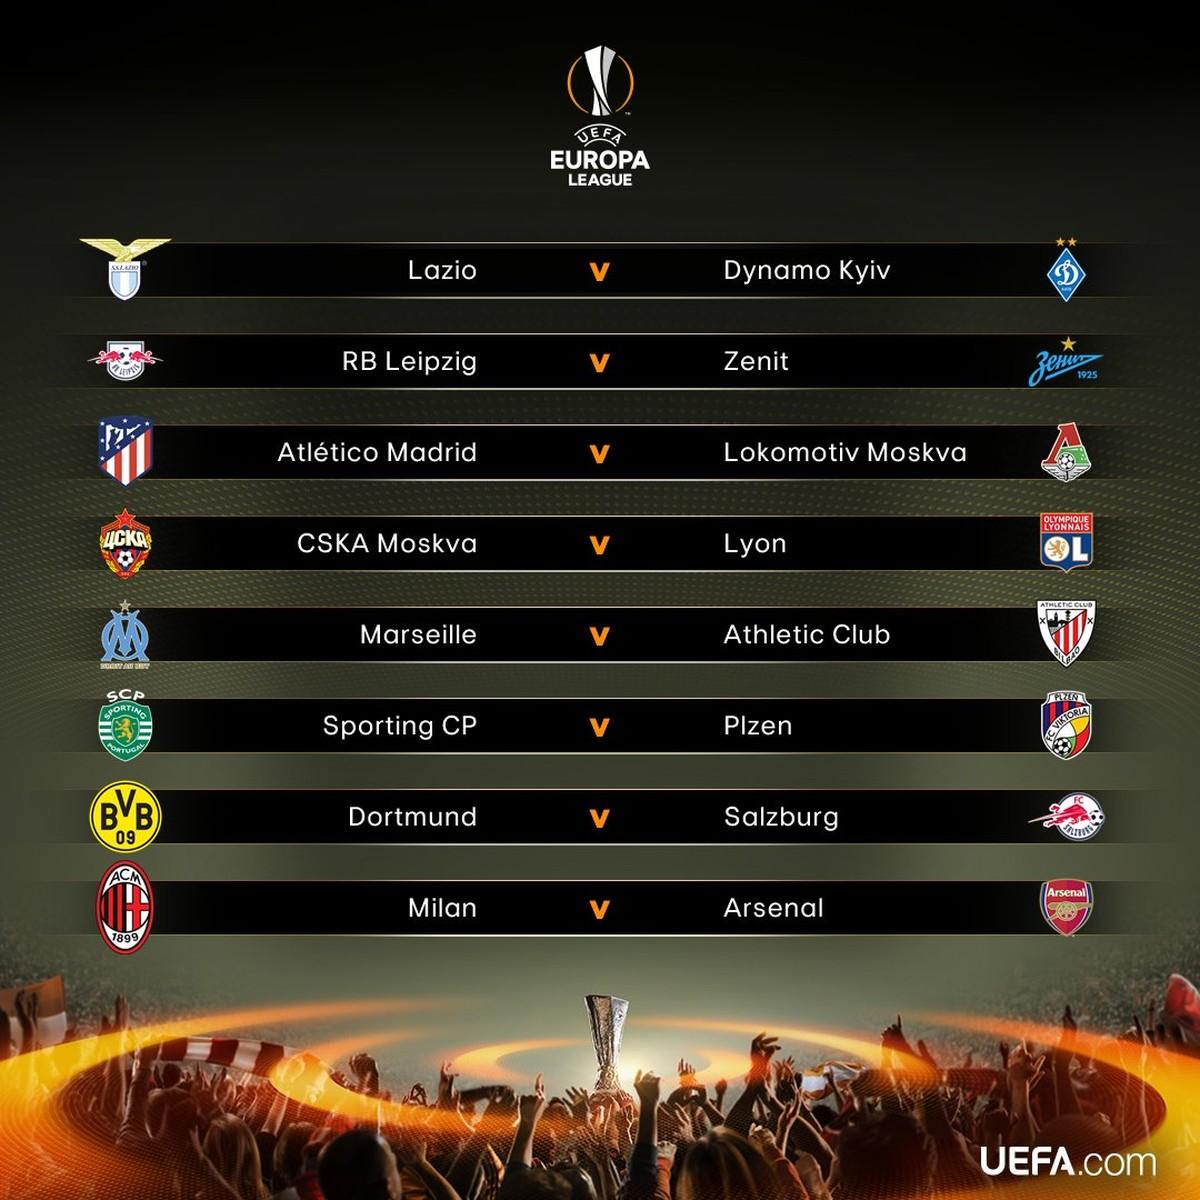 Liga europa jogos